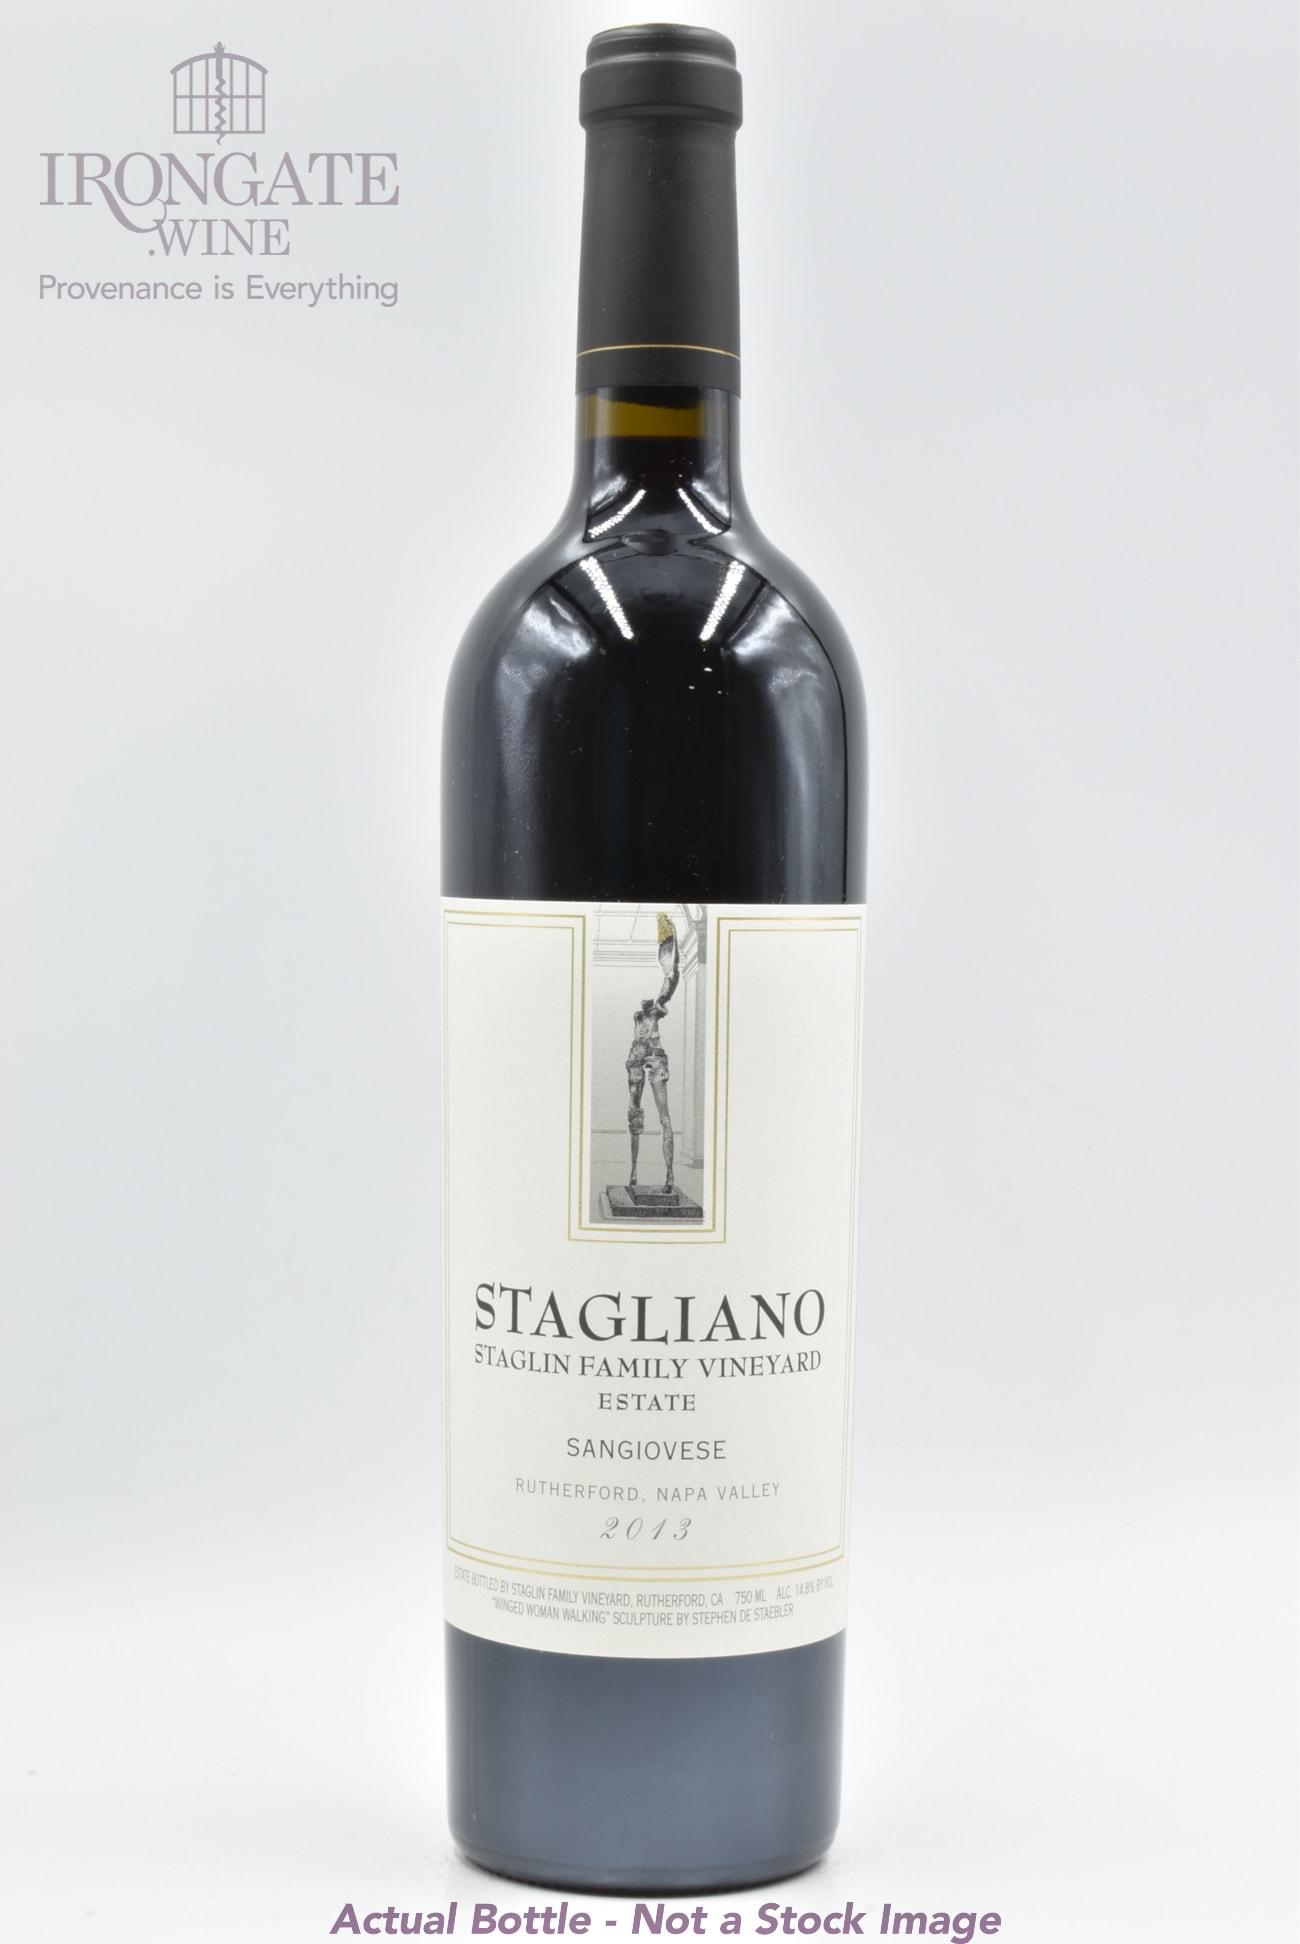 2013 Staglin Stagliano Sangiovese - 750ml - Buy Online - IronGate.Wine